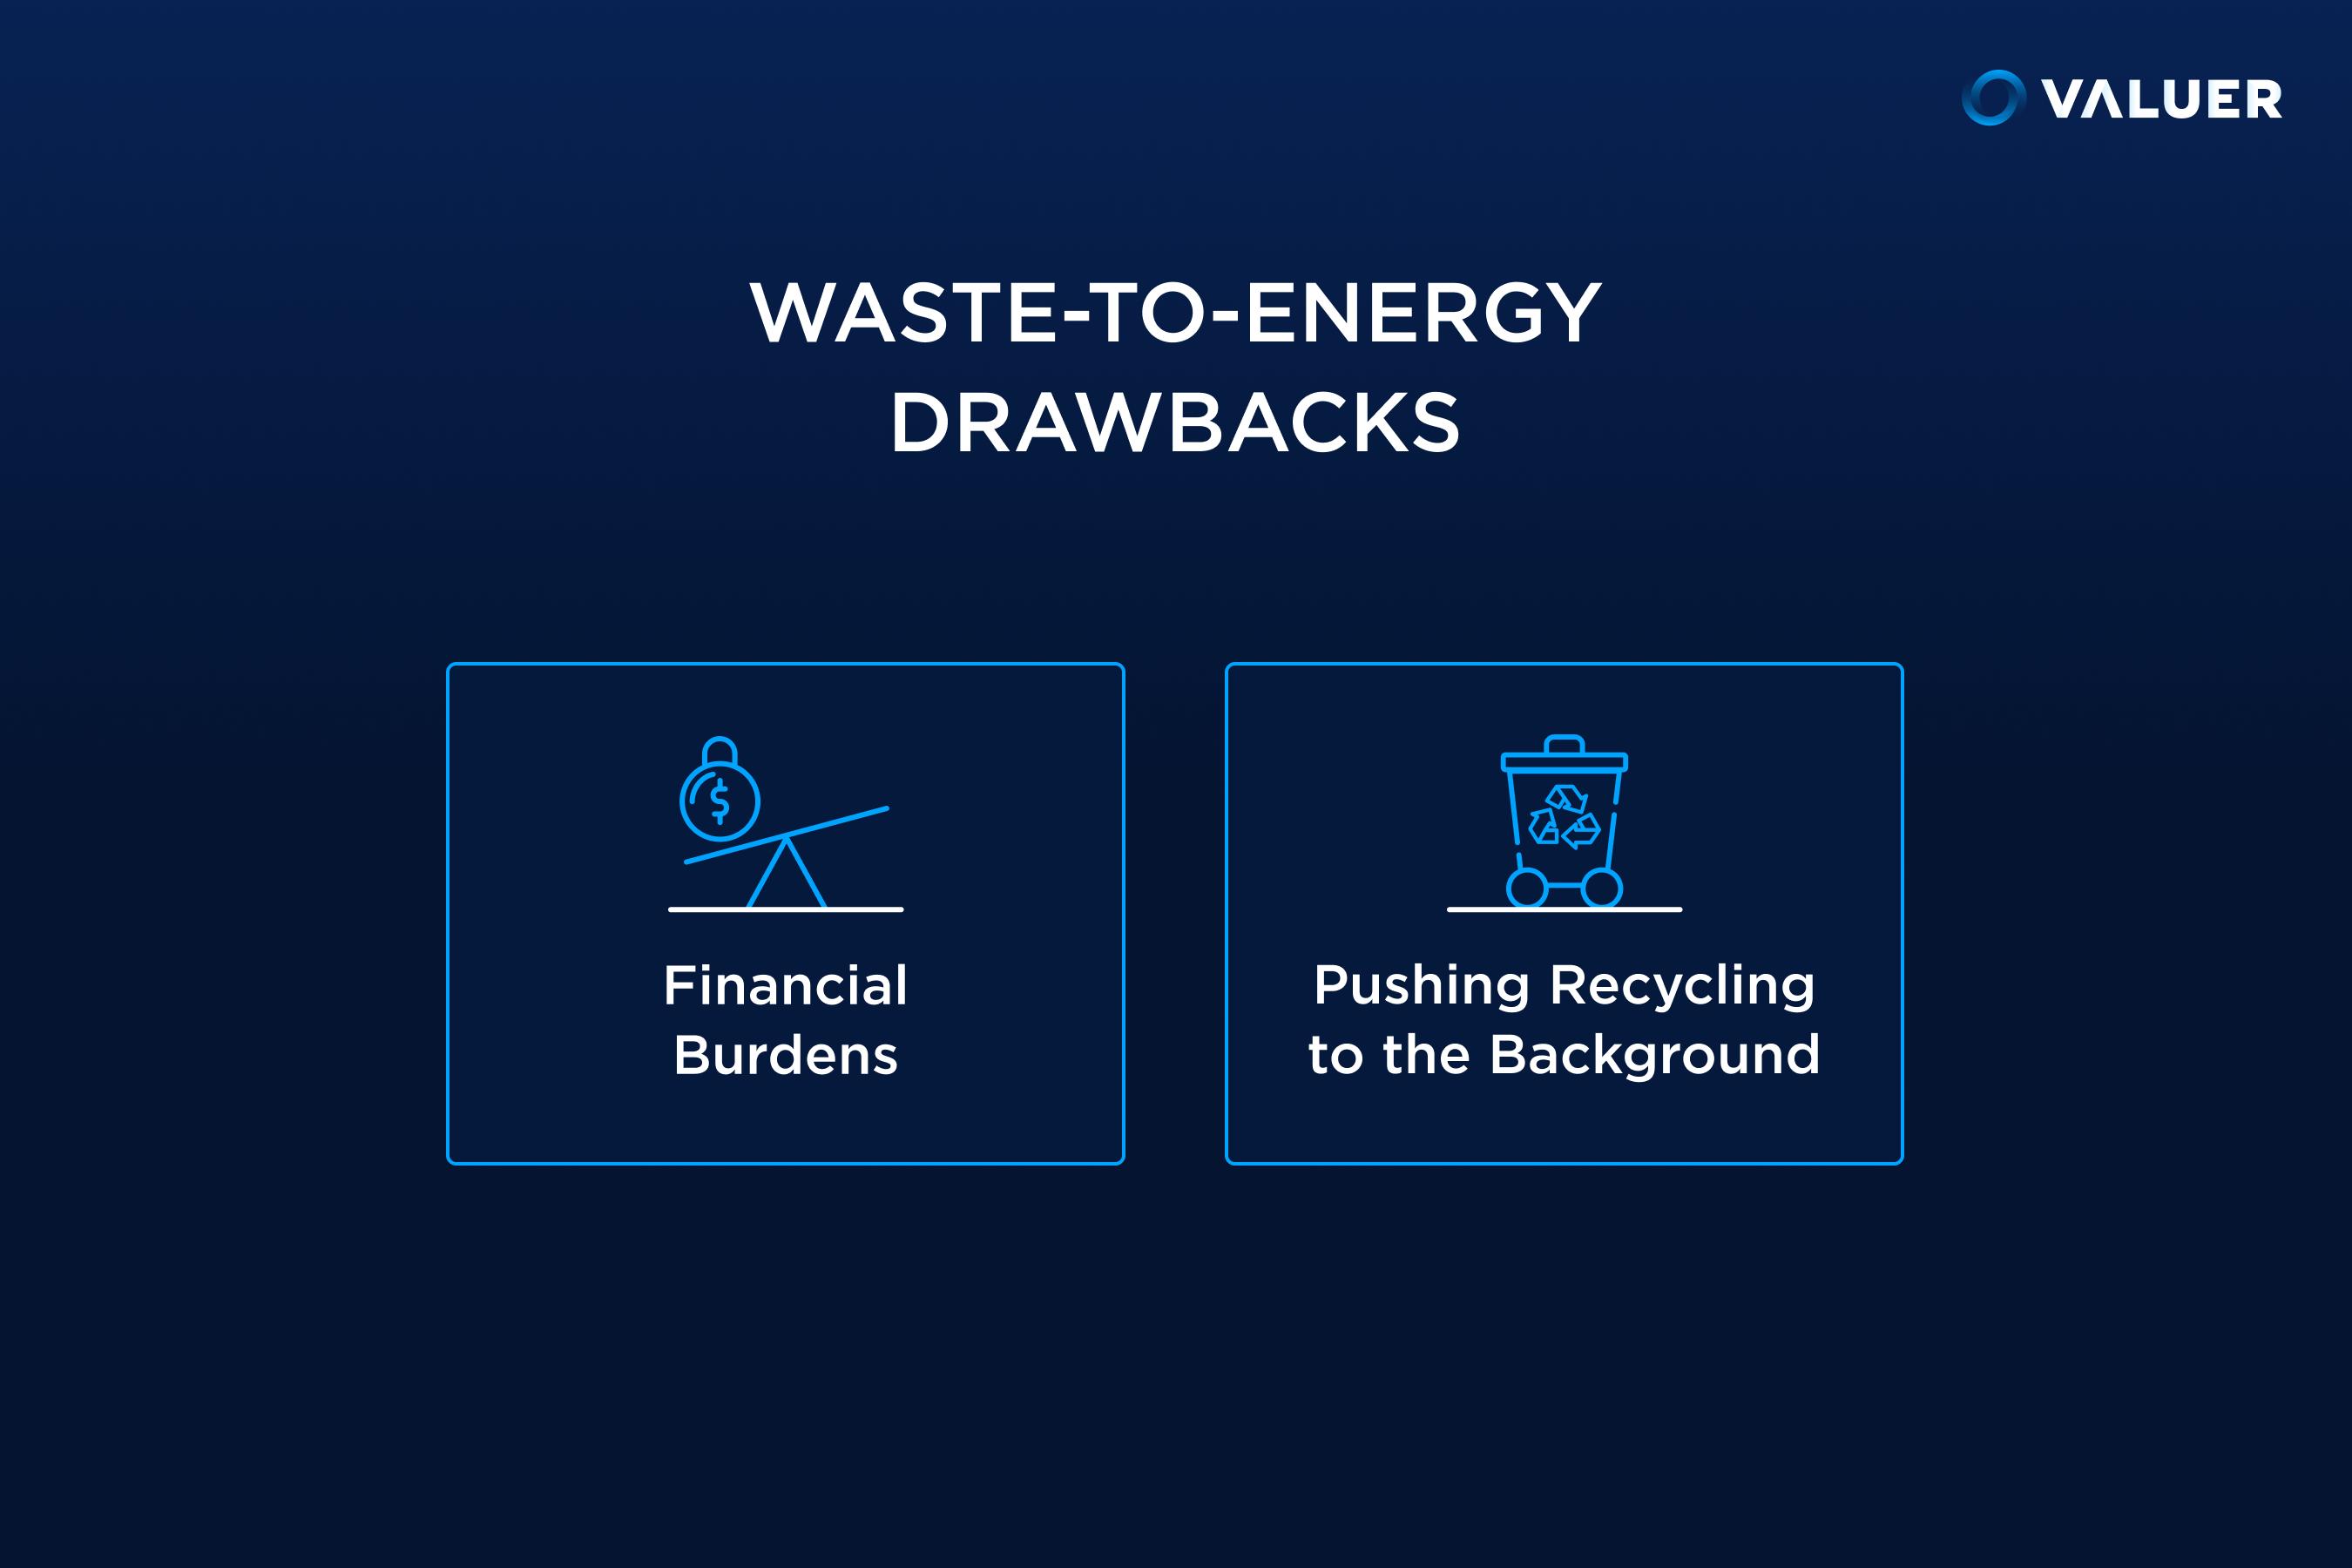 Waste-to-Energy Drawbacks